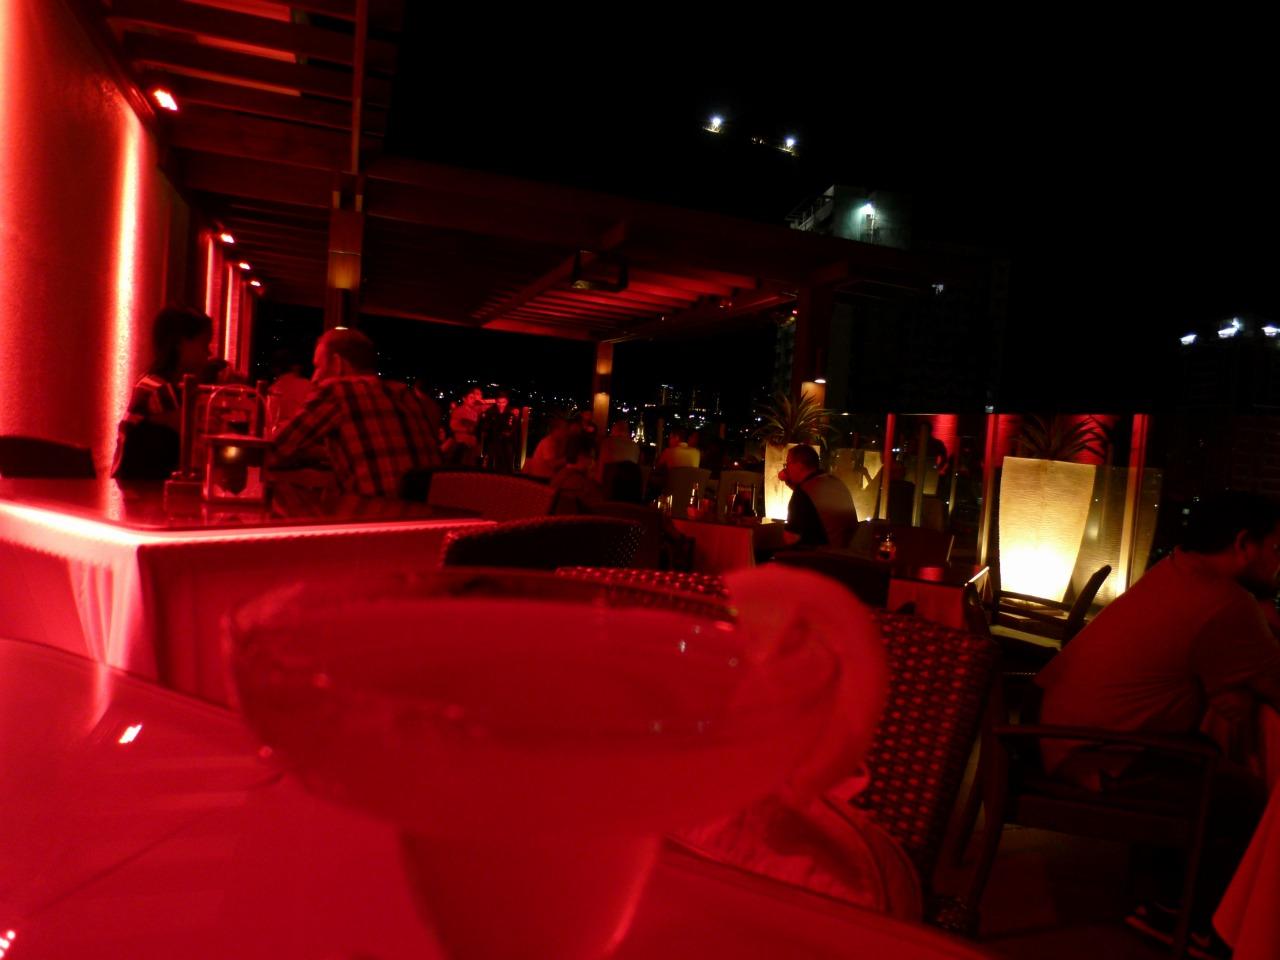 Harolds Hotel bar